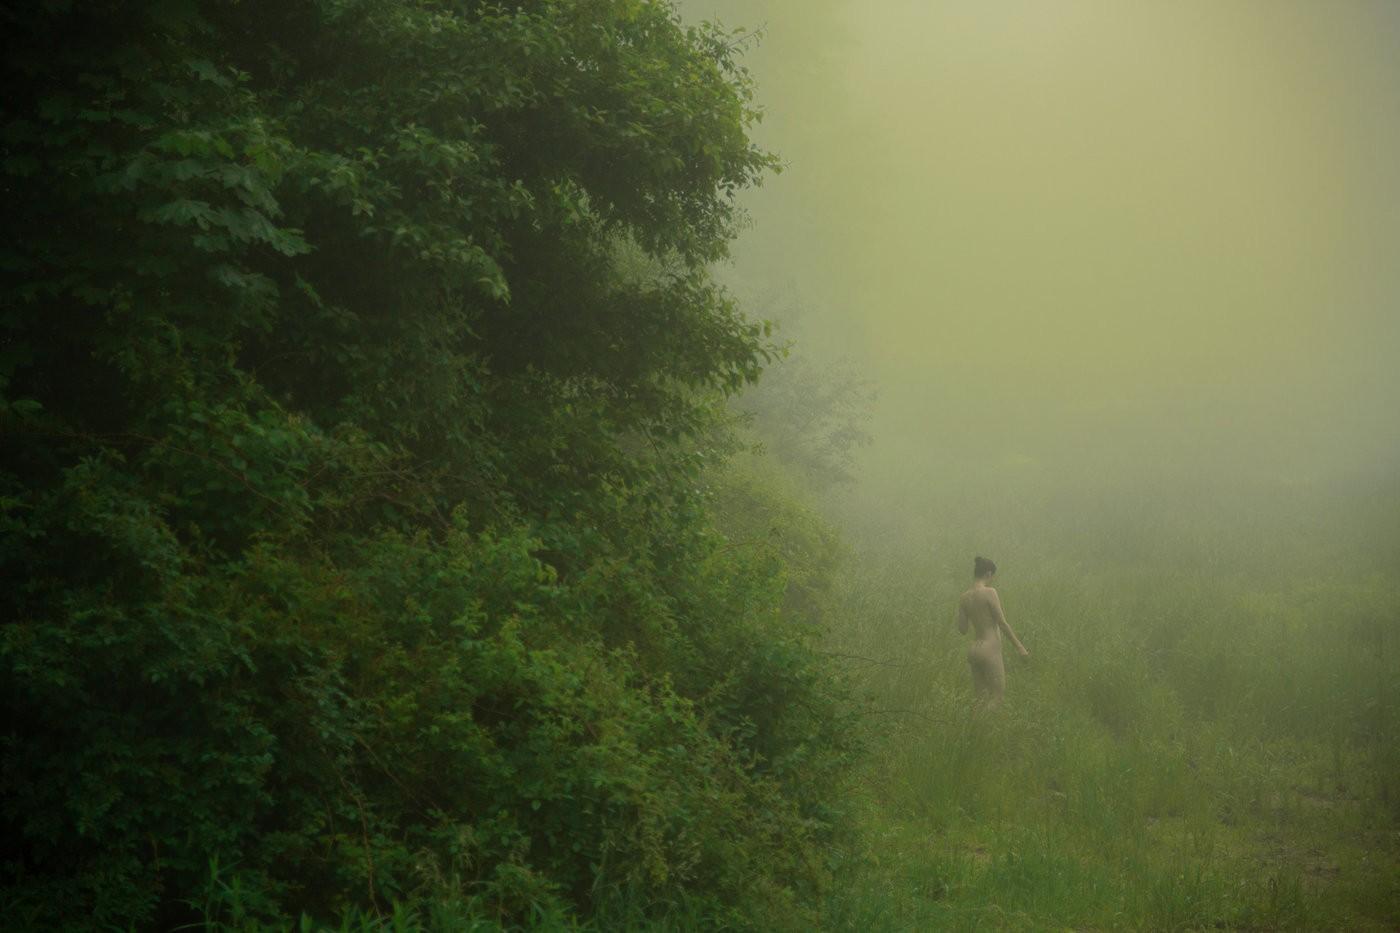 Фотопроект «Сад», 2019 год. Фотограф Эрик Мадиган Хек